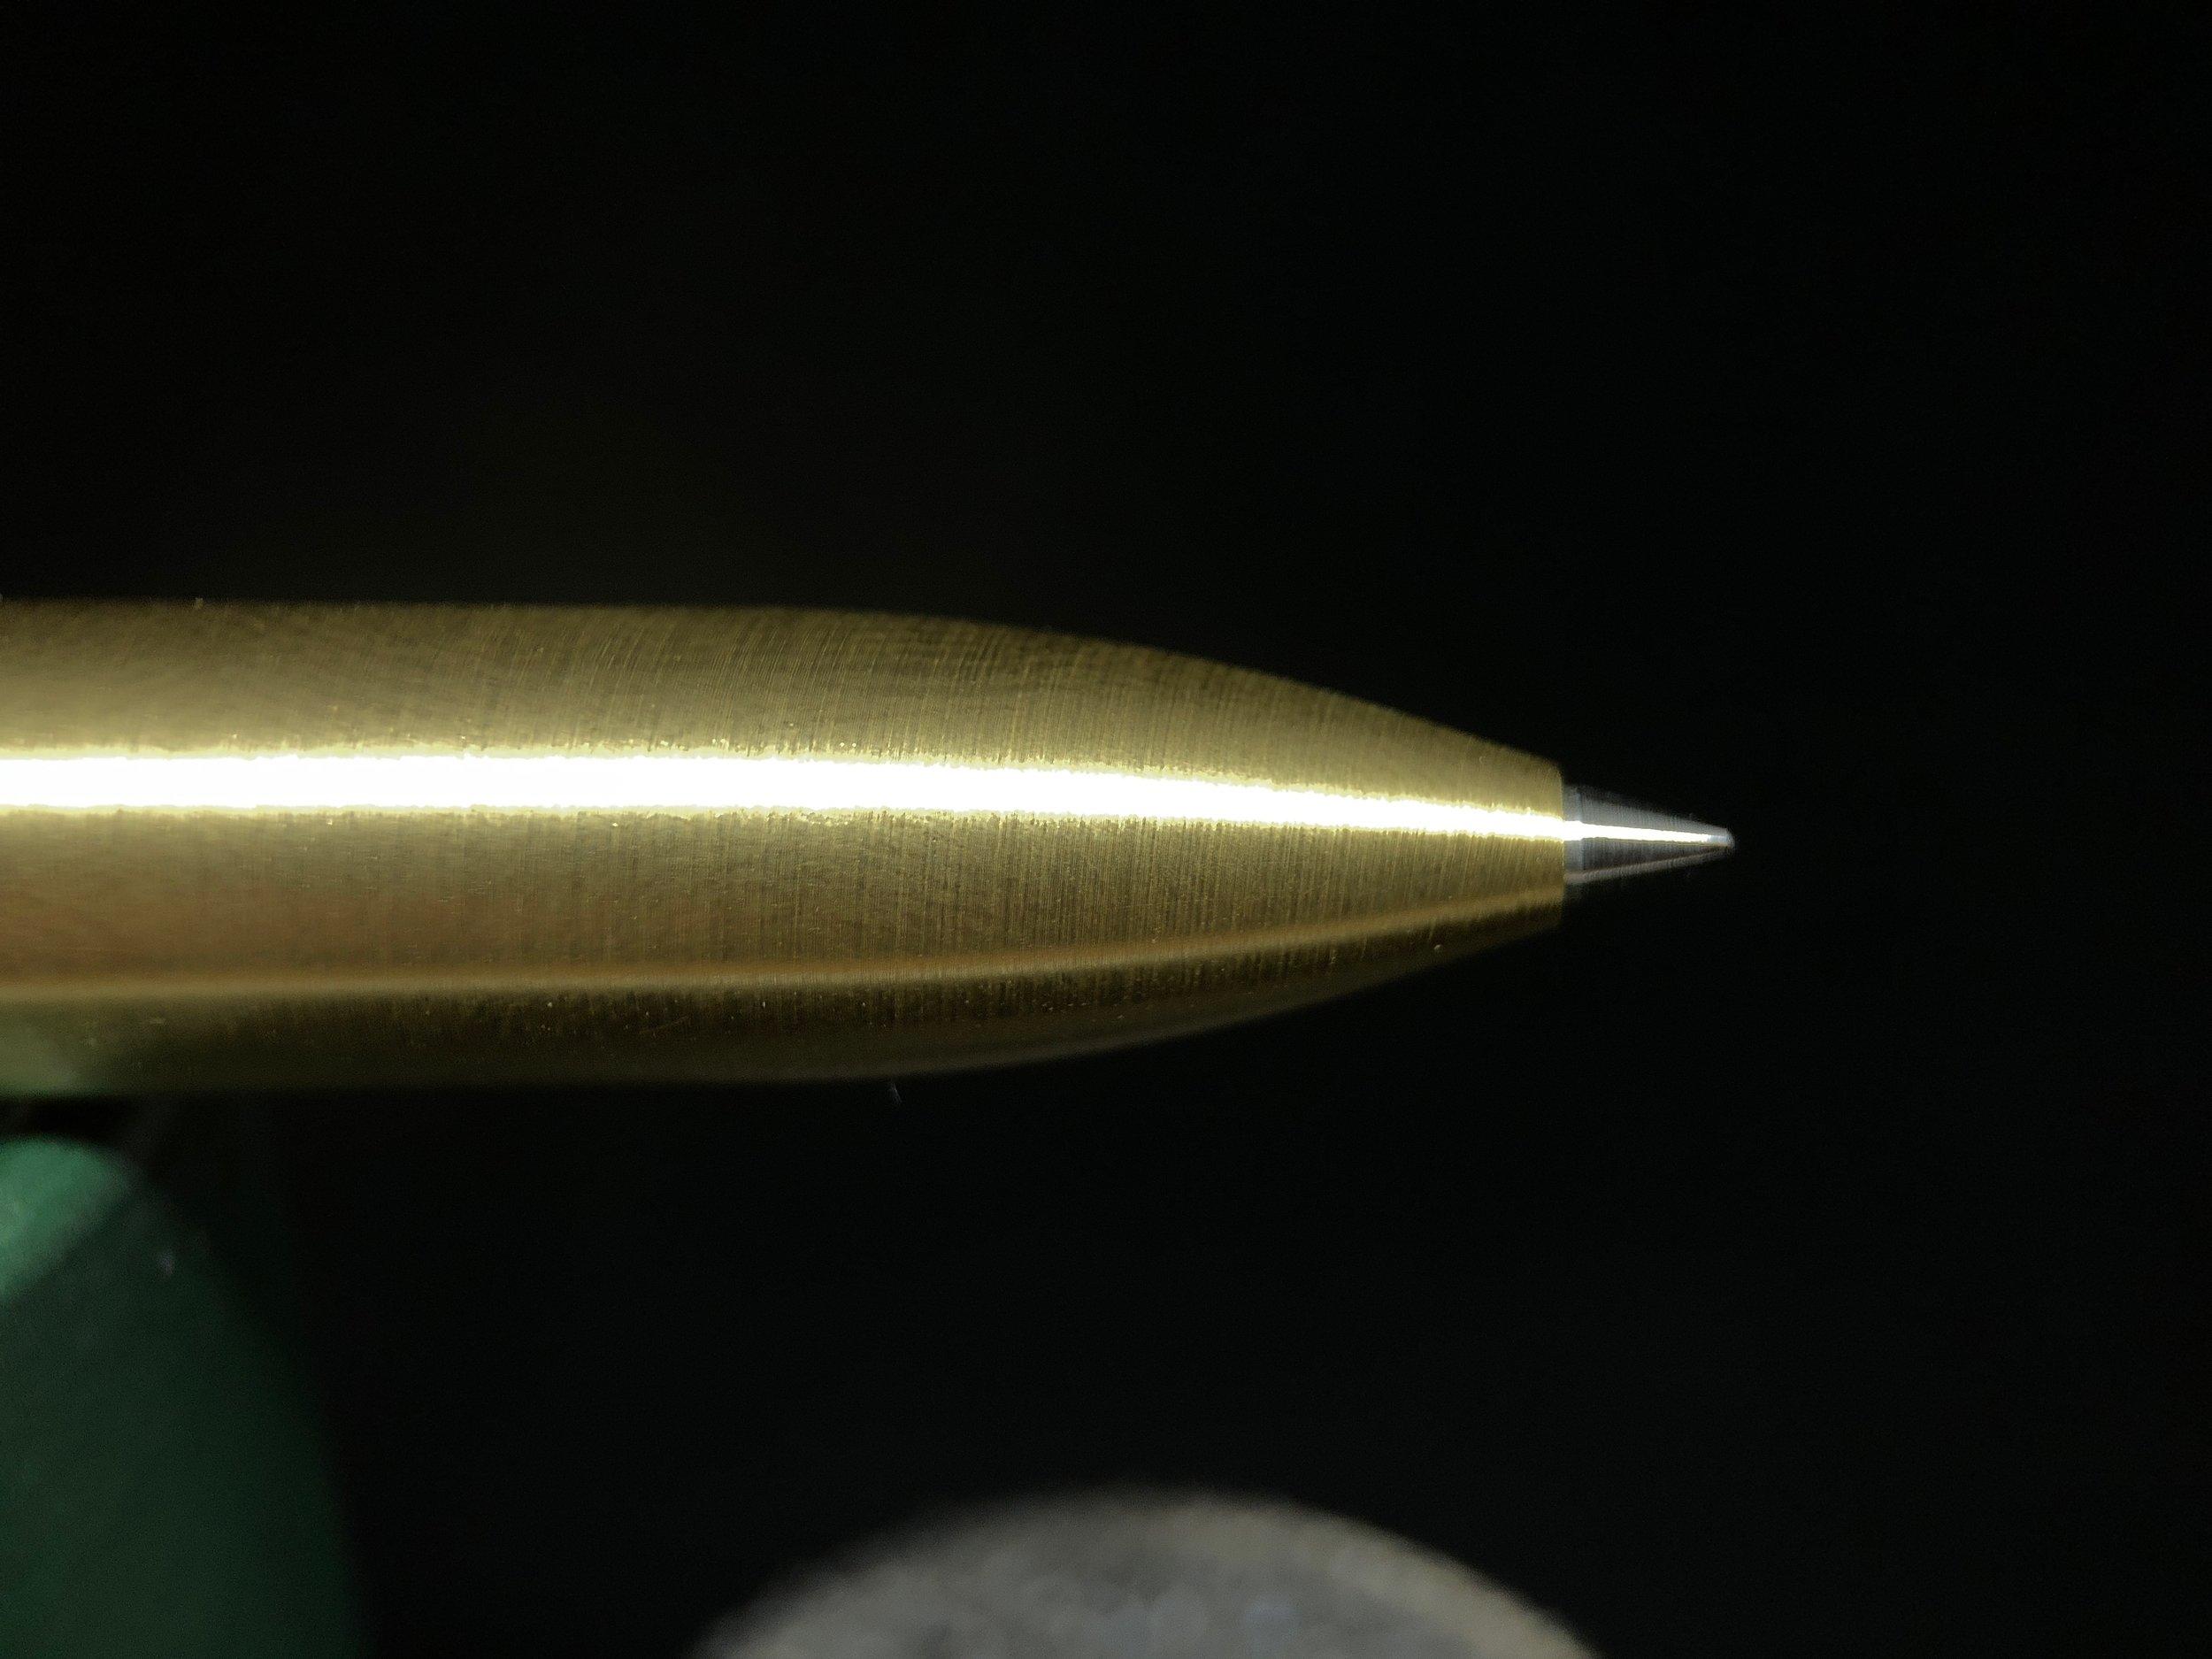 baron-fig-squire-pen-key-brass-9.jpg